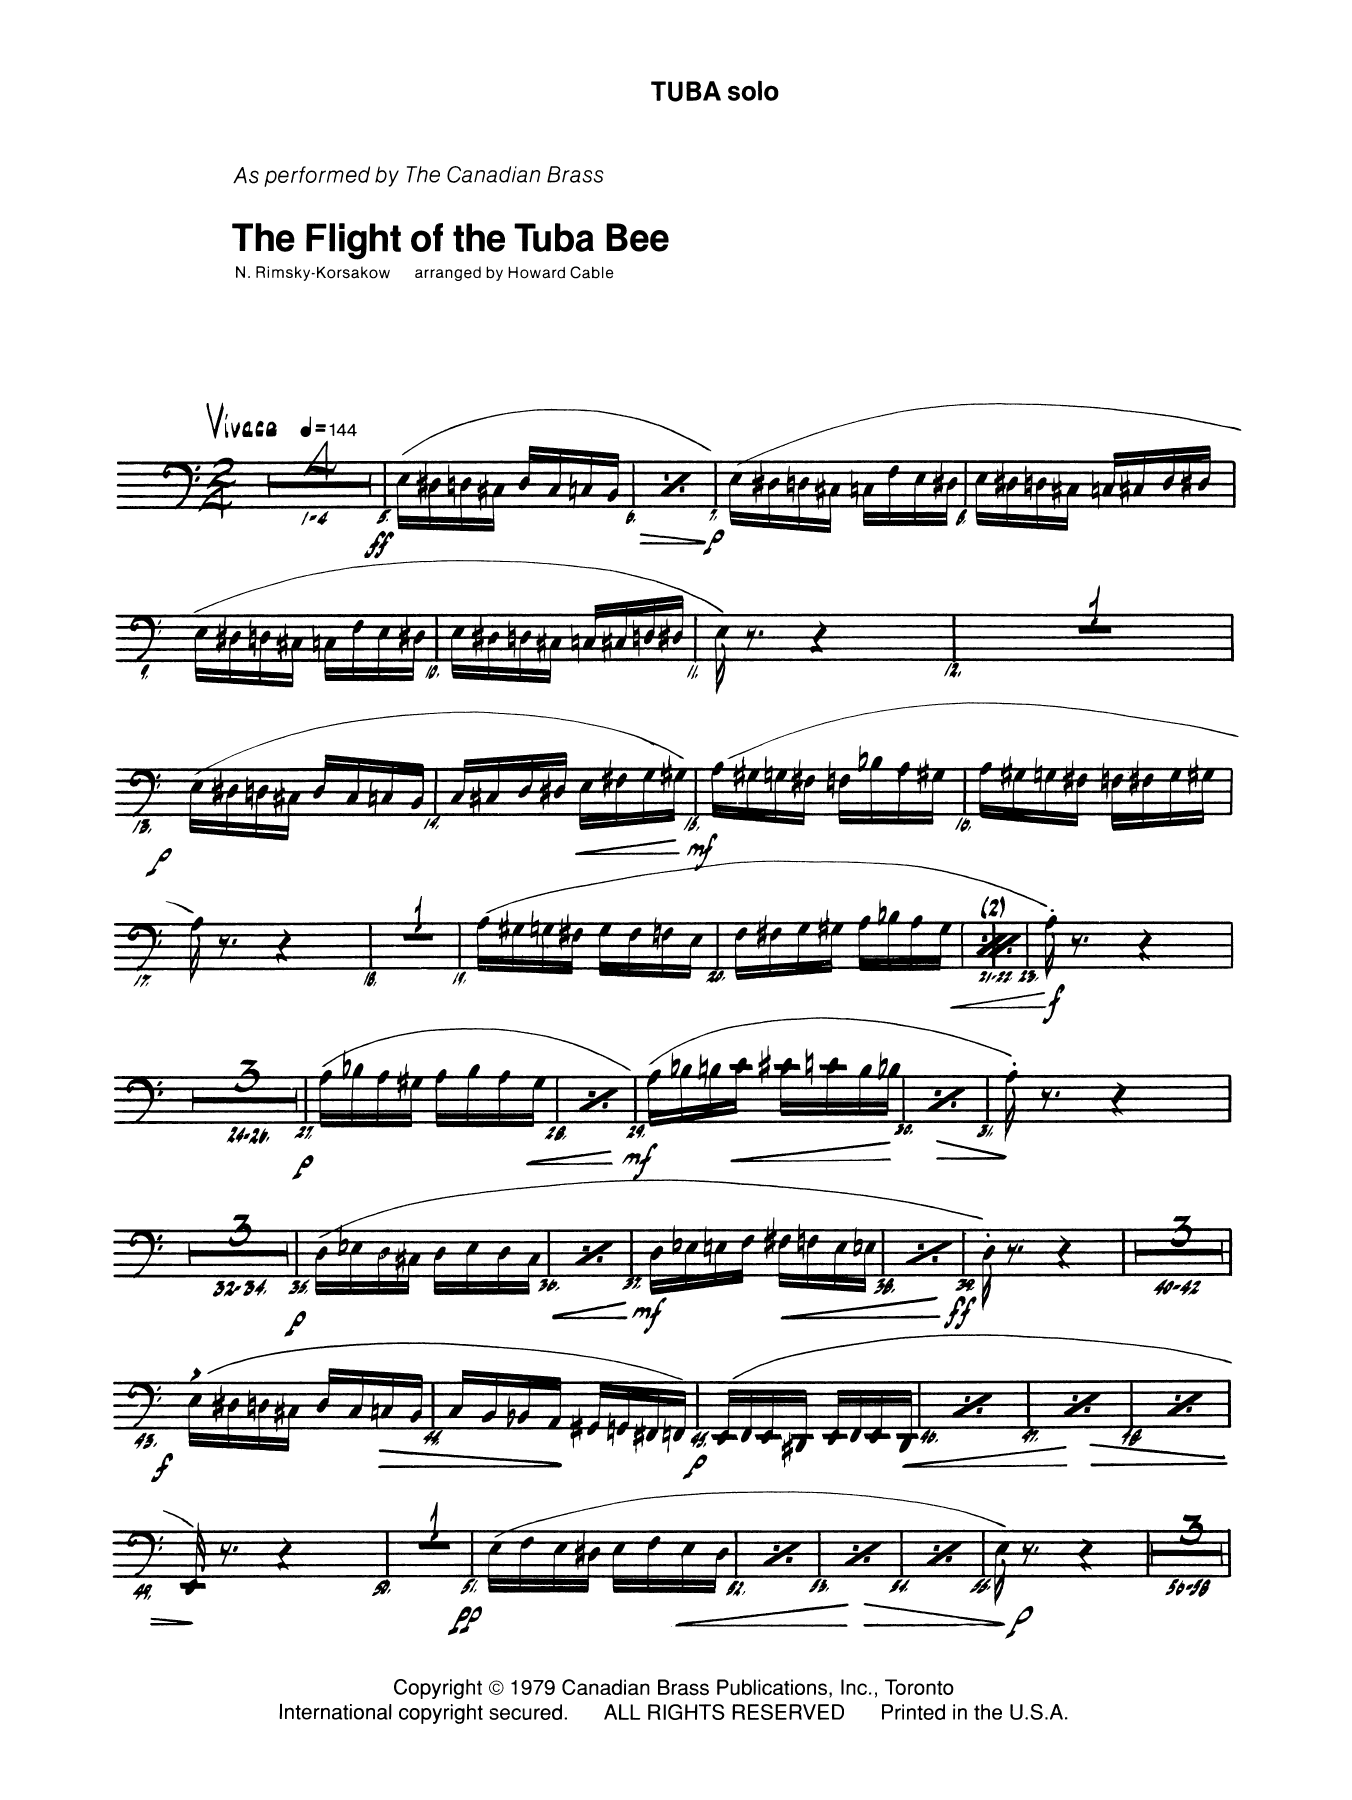 The Flight of the Tuba Bee - Tuba Digitale Noten